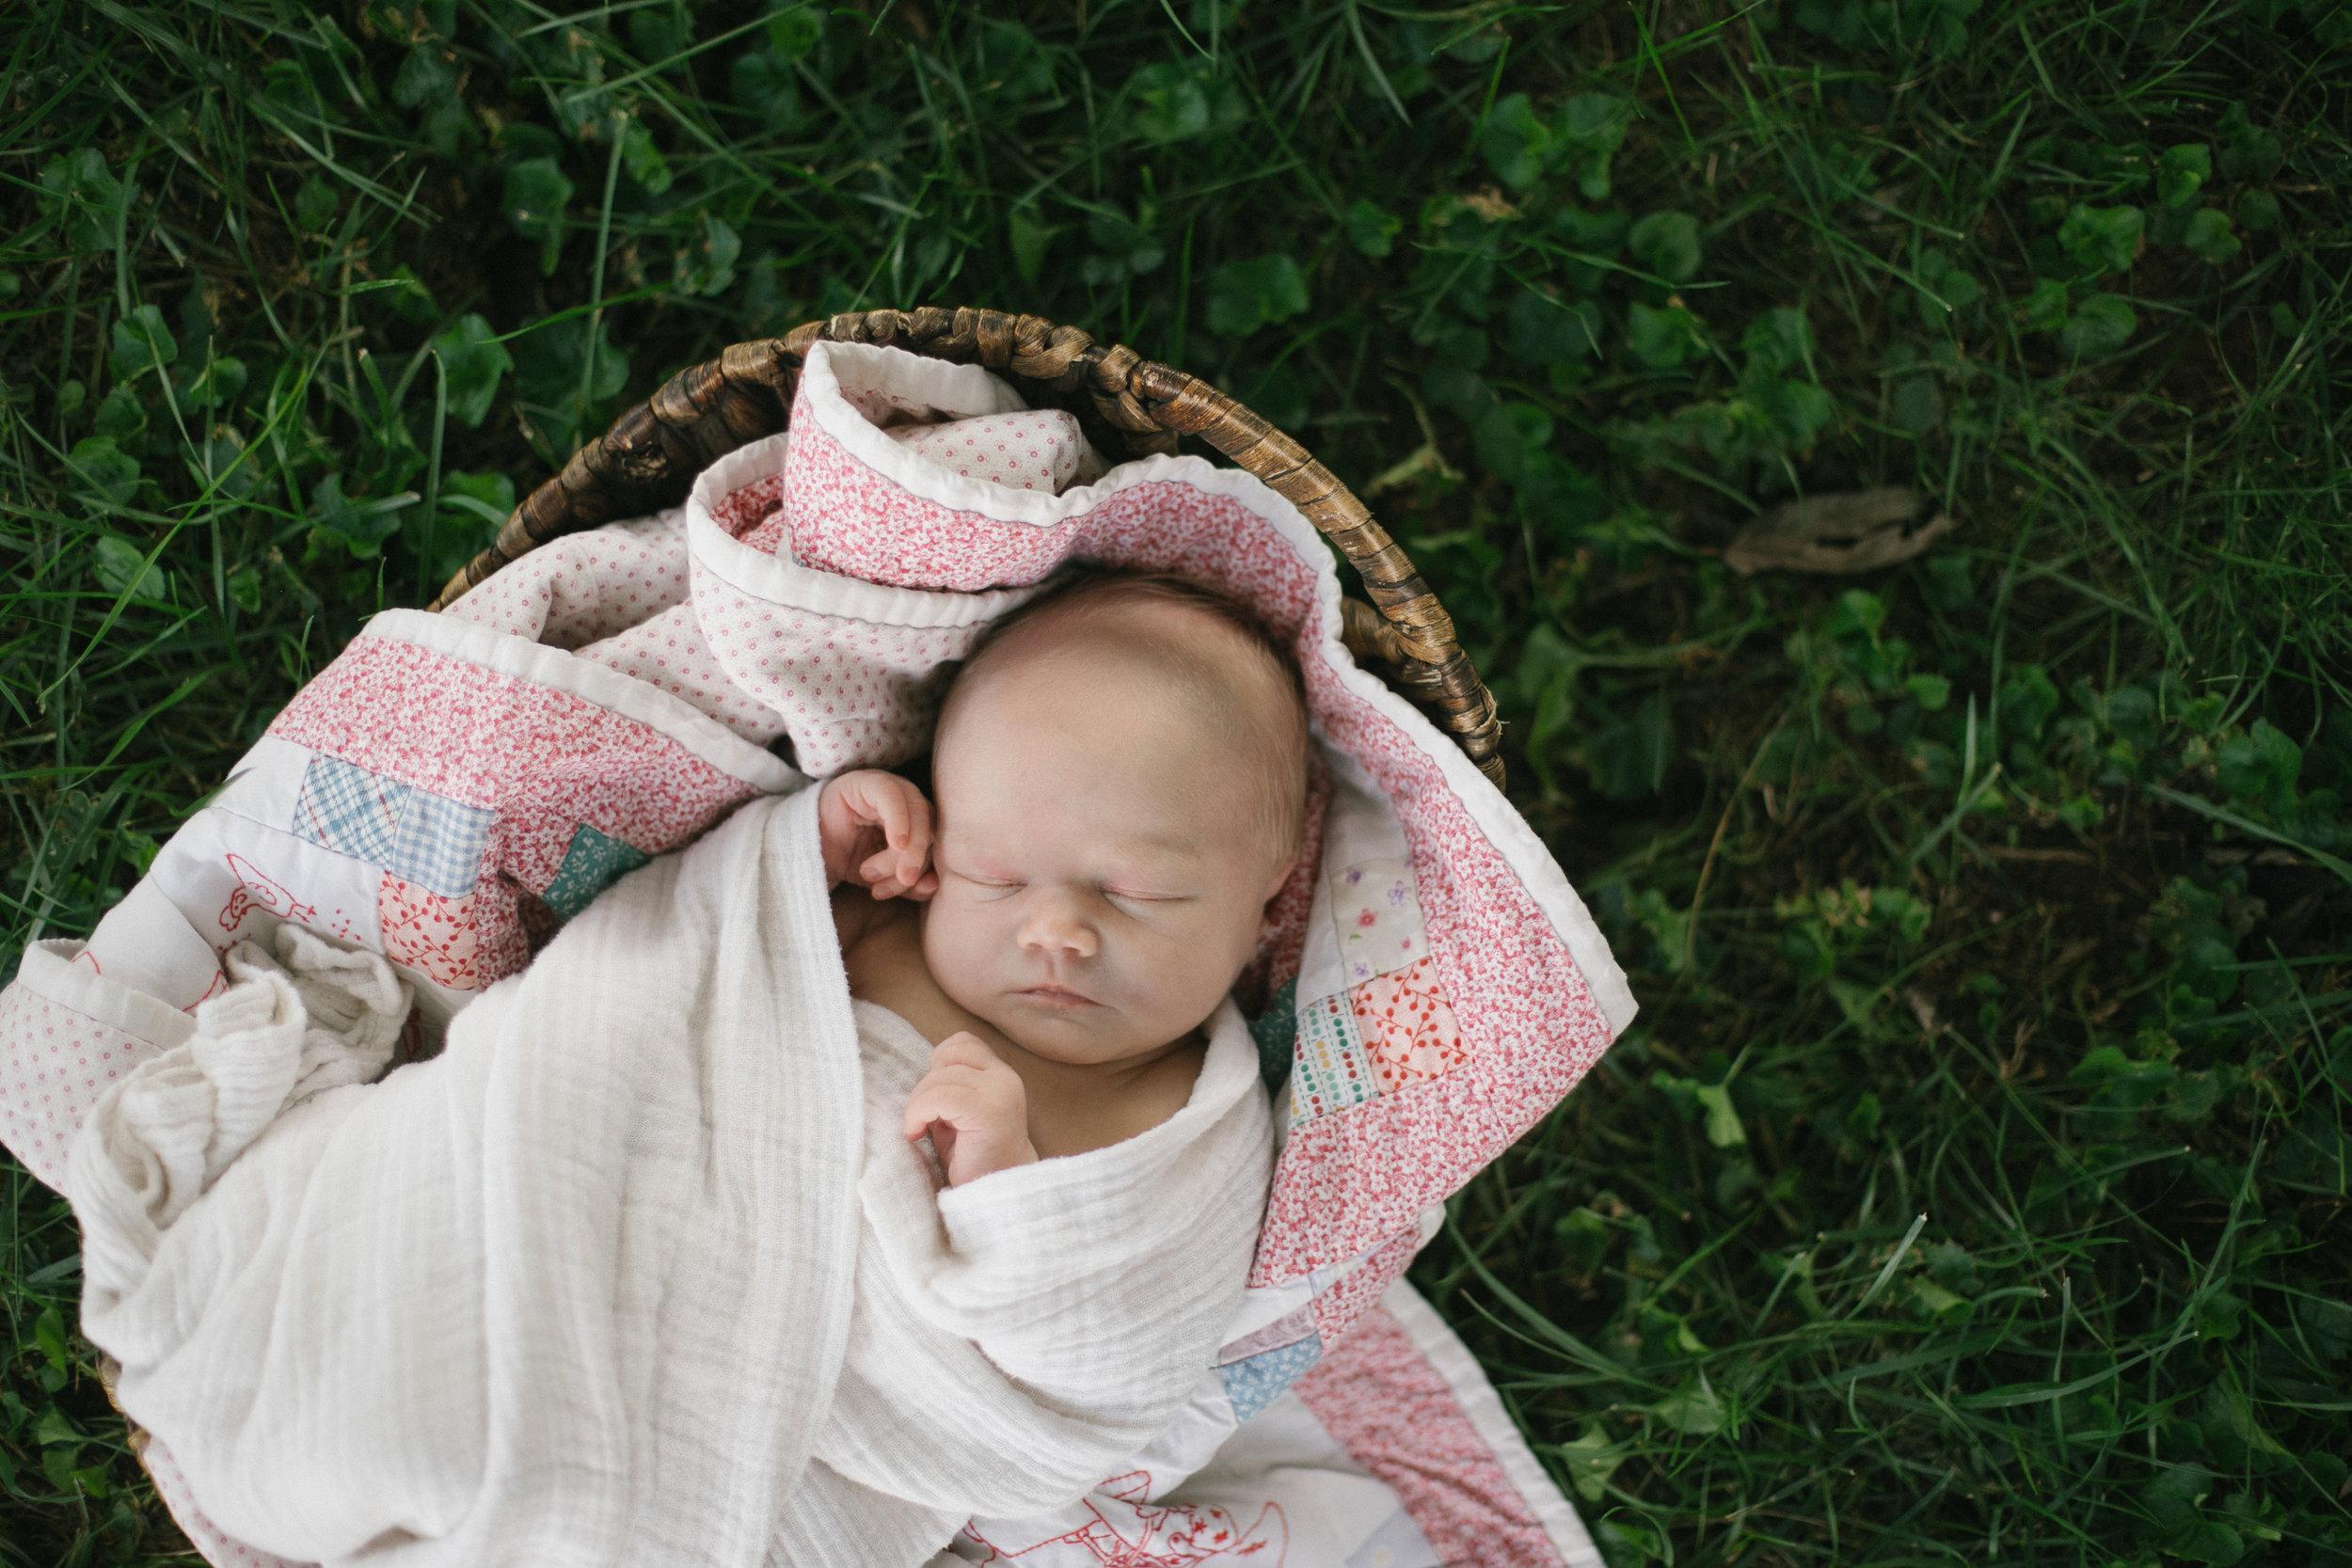 2017.08.17_BeauxHam_Newborn_preview-0029.jpg